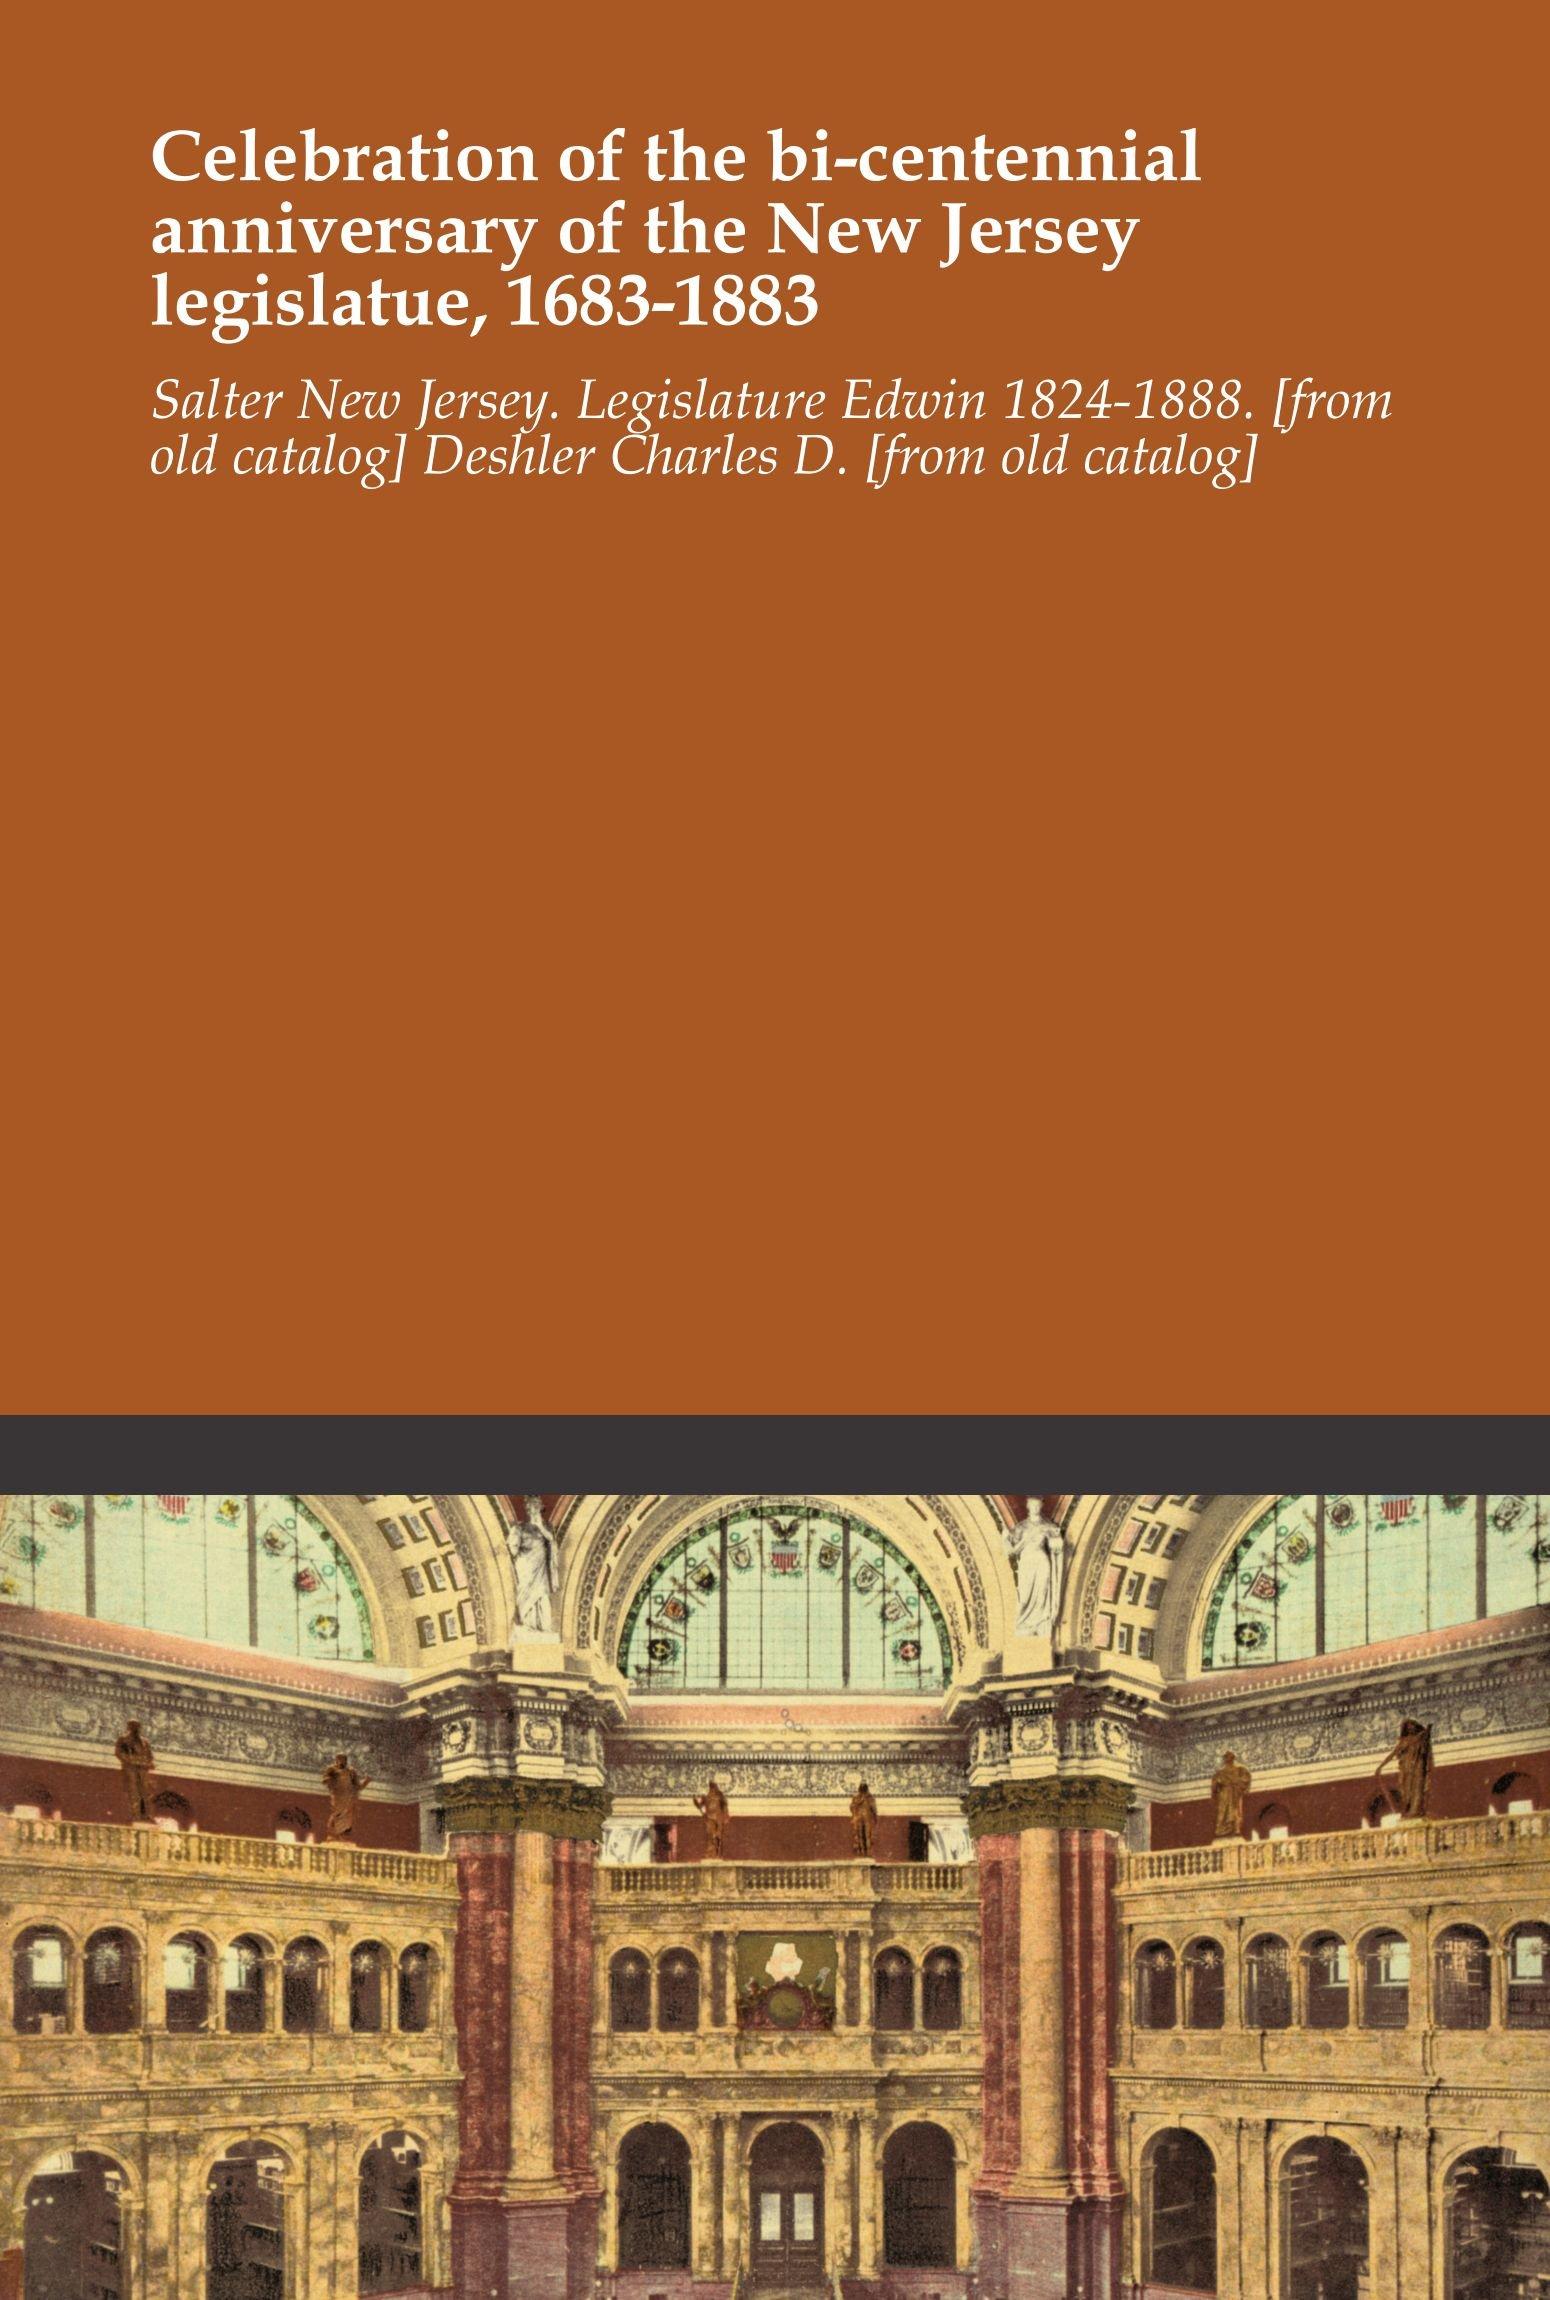 Download Celebration of the bi-centennial anniversary of the New Jersey legislatue, 1683-1883 pdf